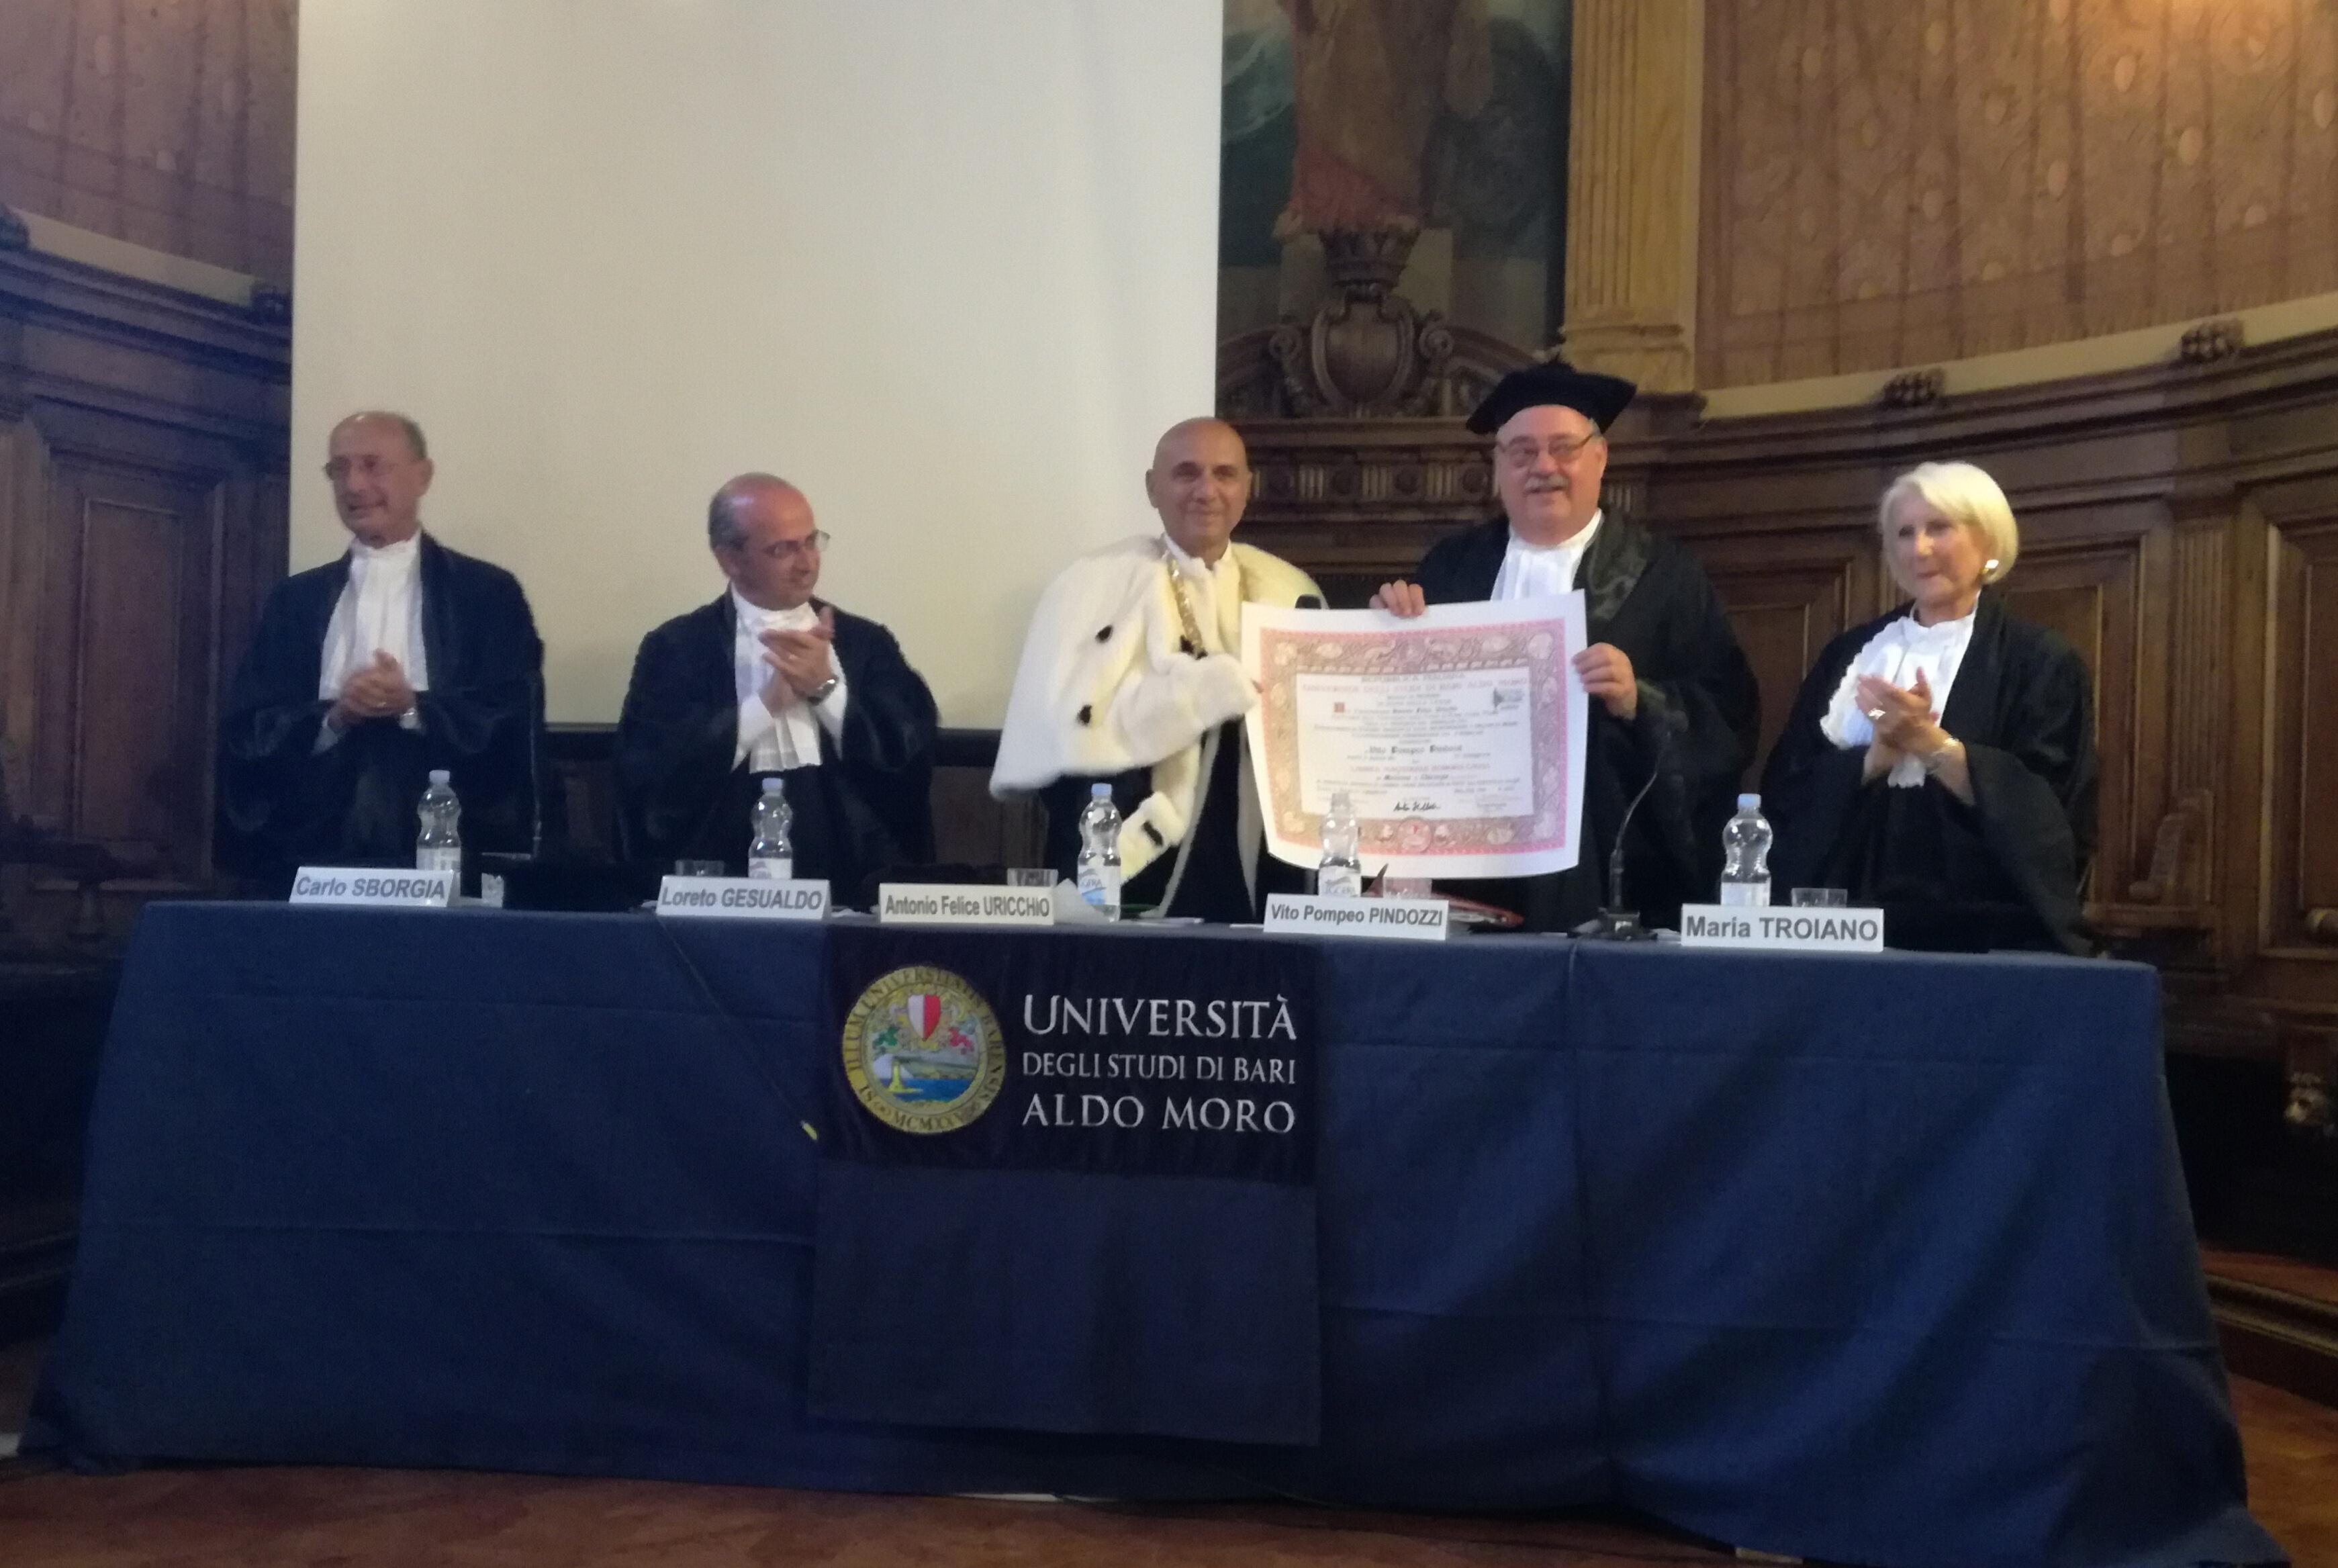 Vito Pompeo Pindozzi-Laurea Honoris Causa-Bari